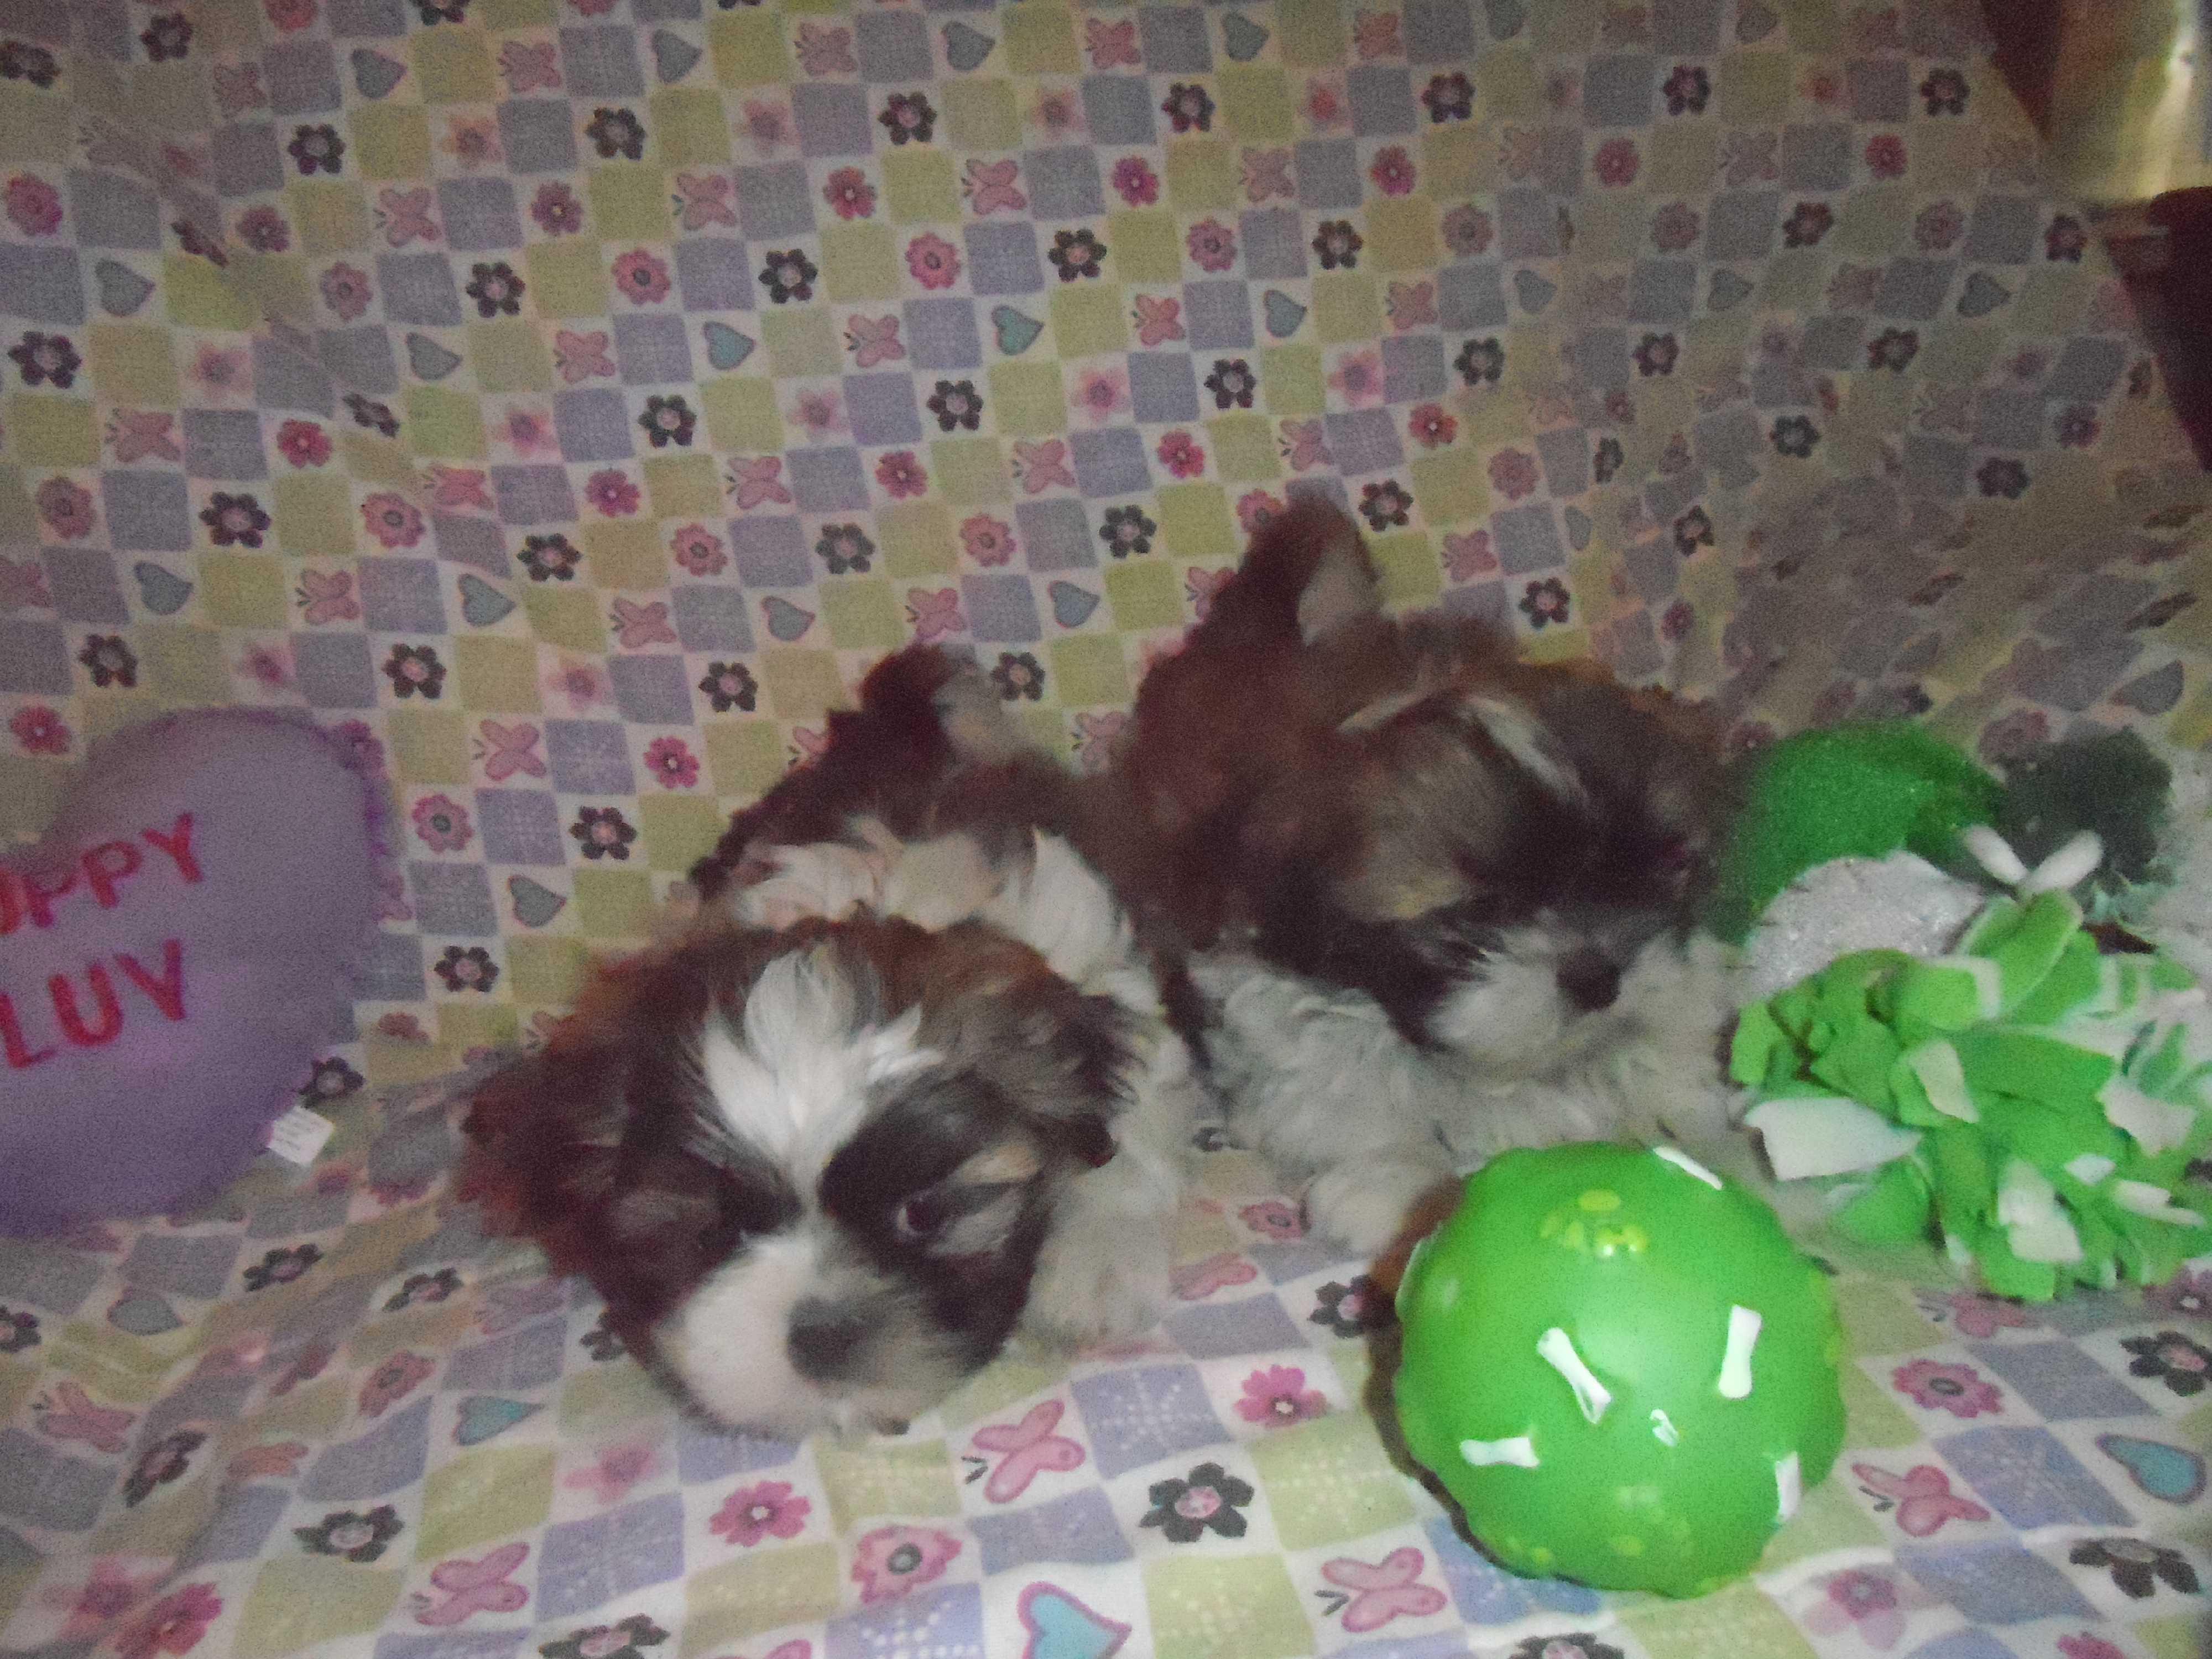 Riverside Ca Shih Tzu Meet 5 Darling Shih Tzu Puppies A Pet For Adoption